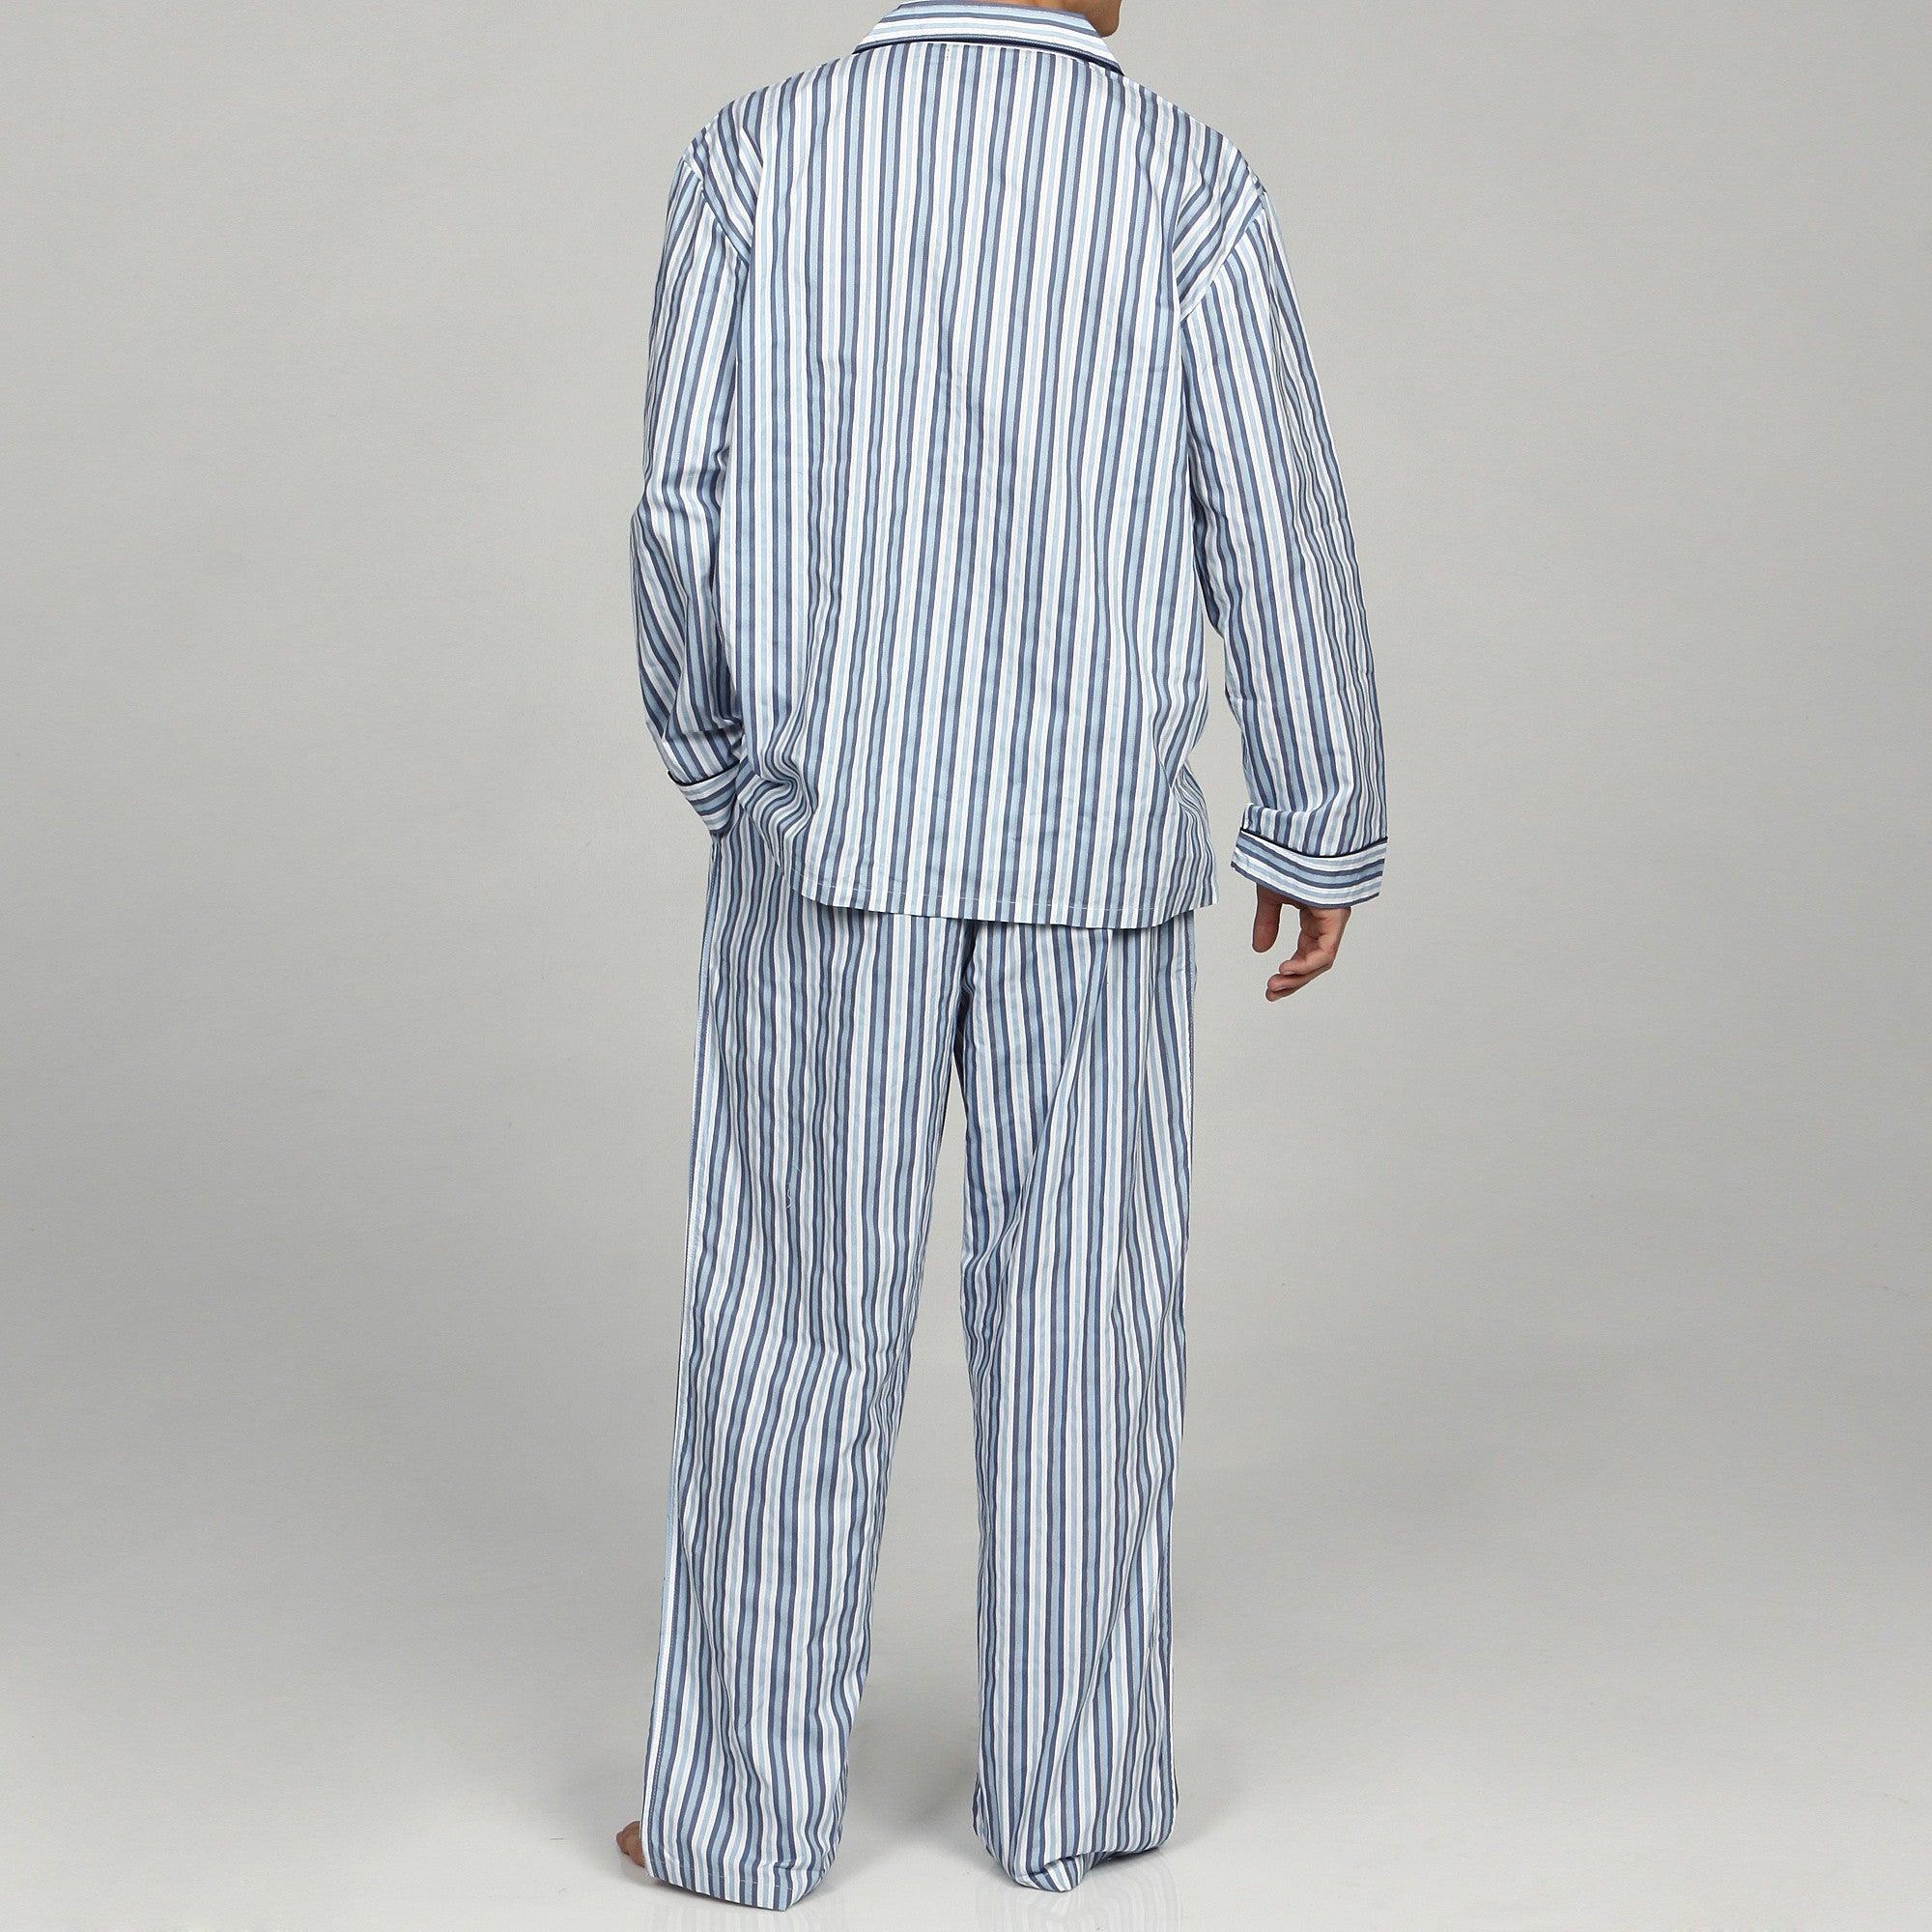 Shop Alexander Del Rossa Men s Striped Cotton Pajama Set - Free Shipping  Today - Overstock - 6205880 05dd31cc8